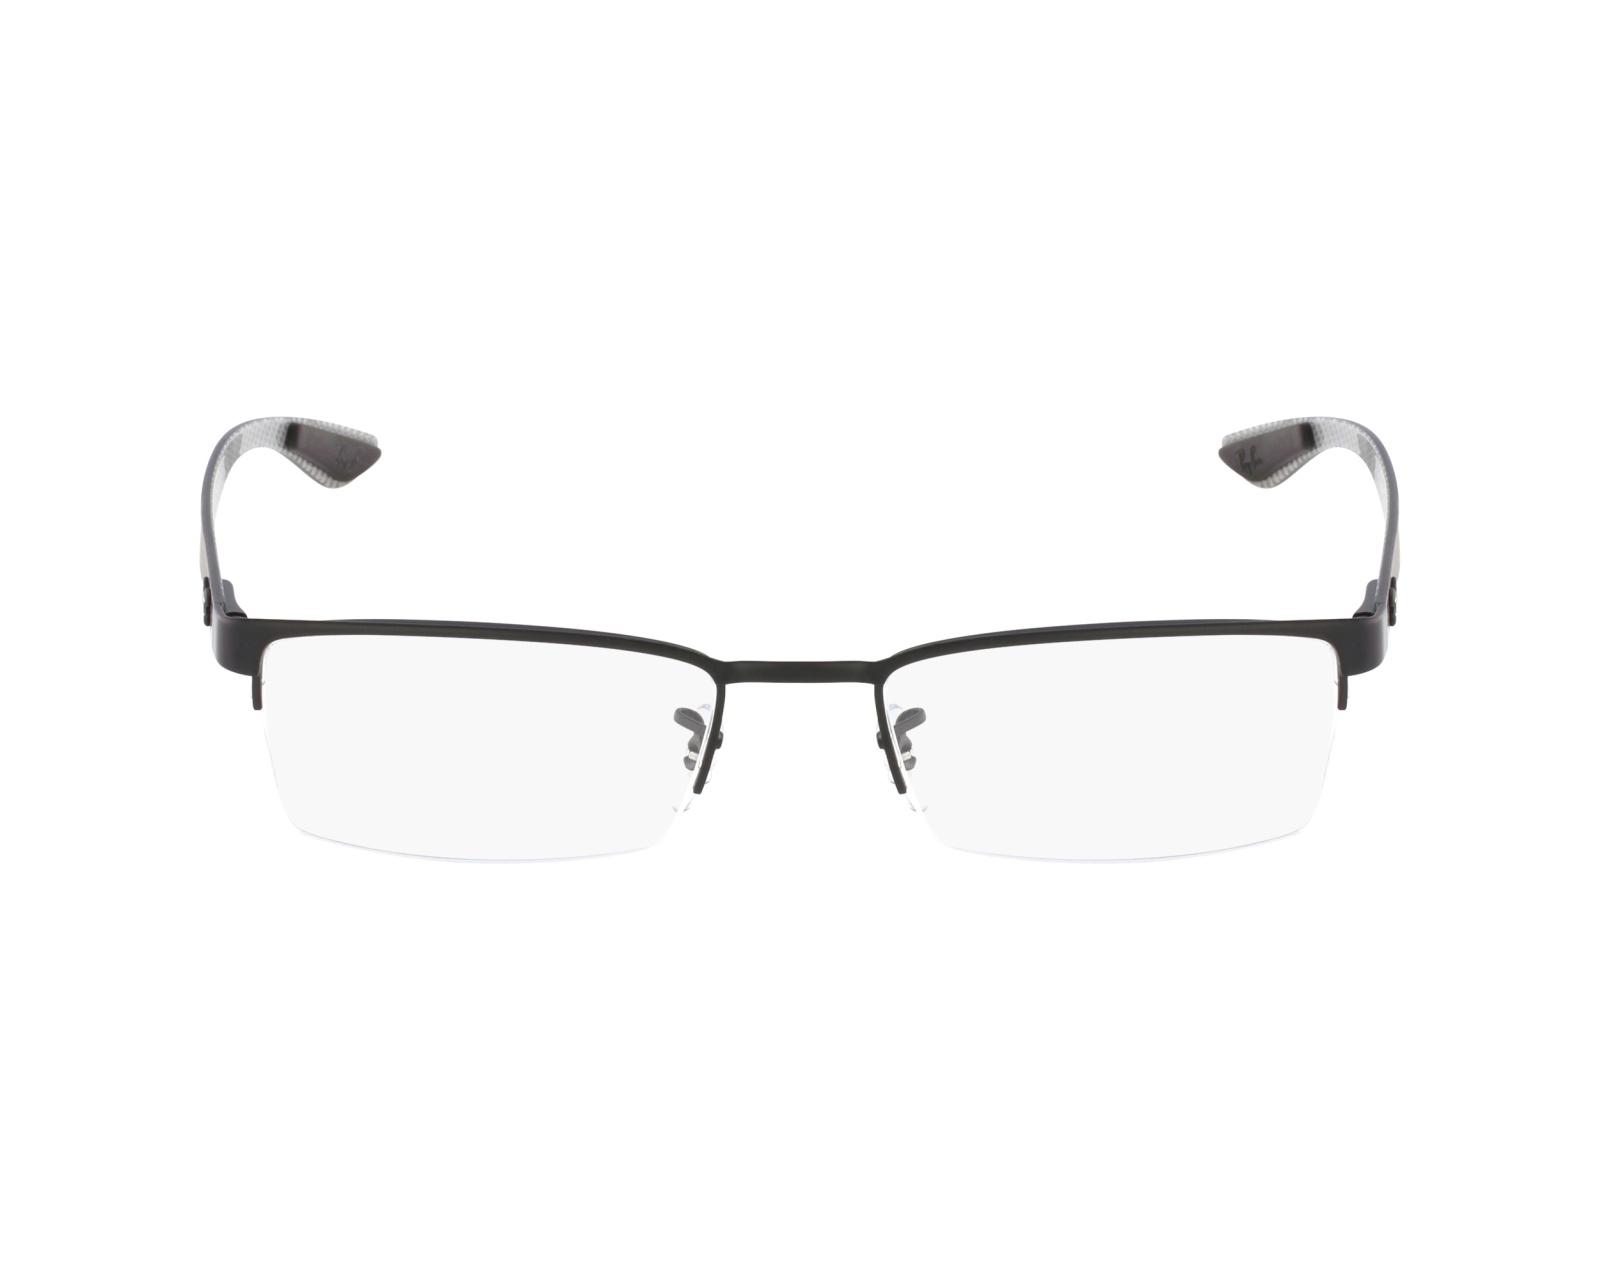 e51846e3249 thumbnail eyeglasses Ray-Ban RX-8412 2503 52-17 Black profile view